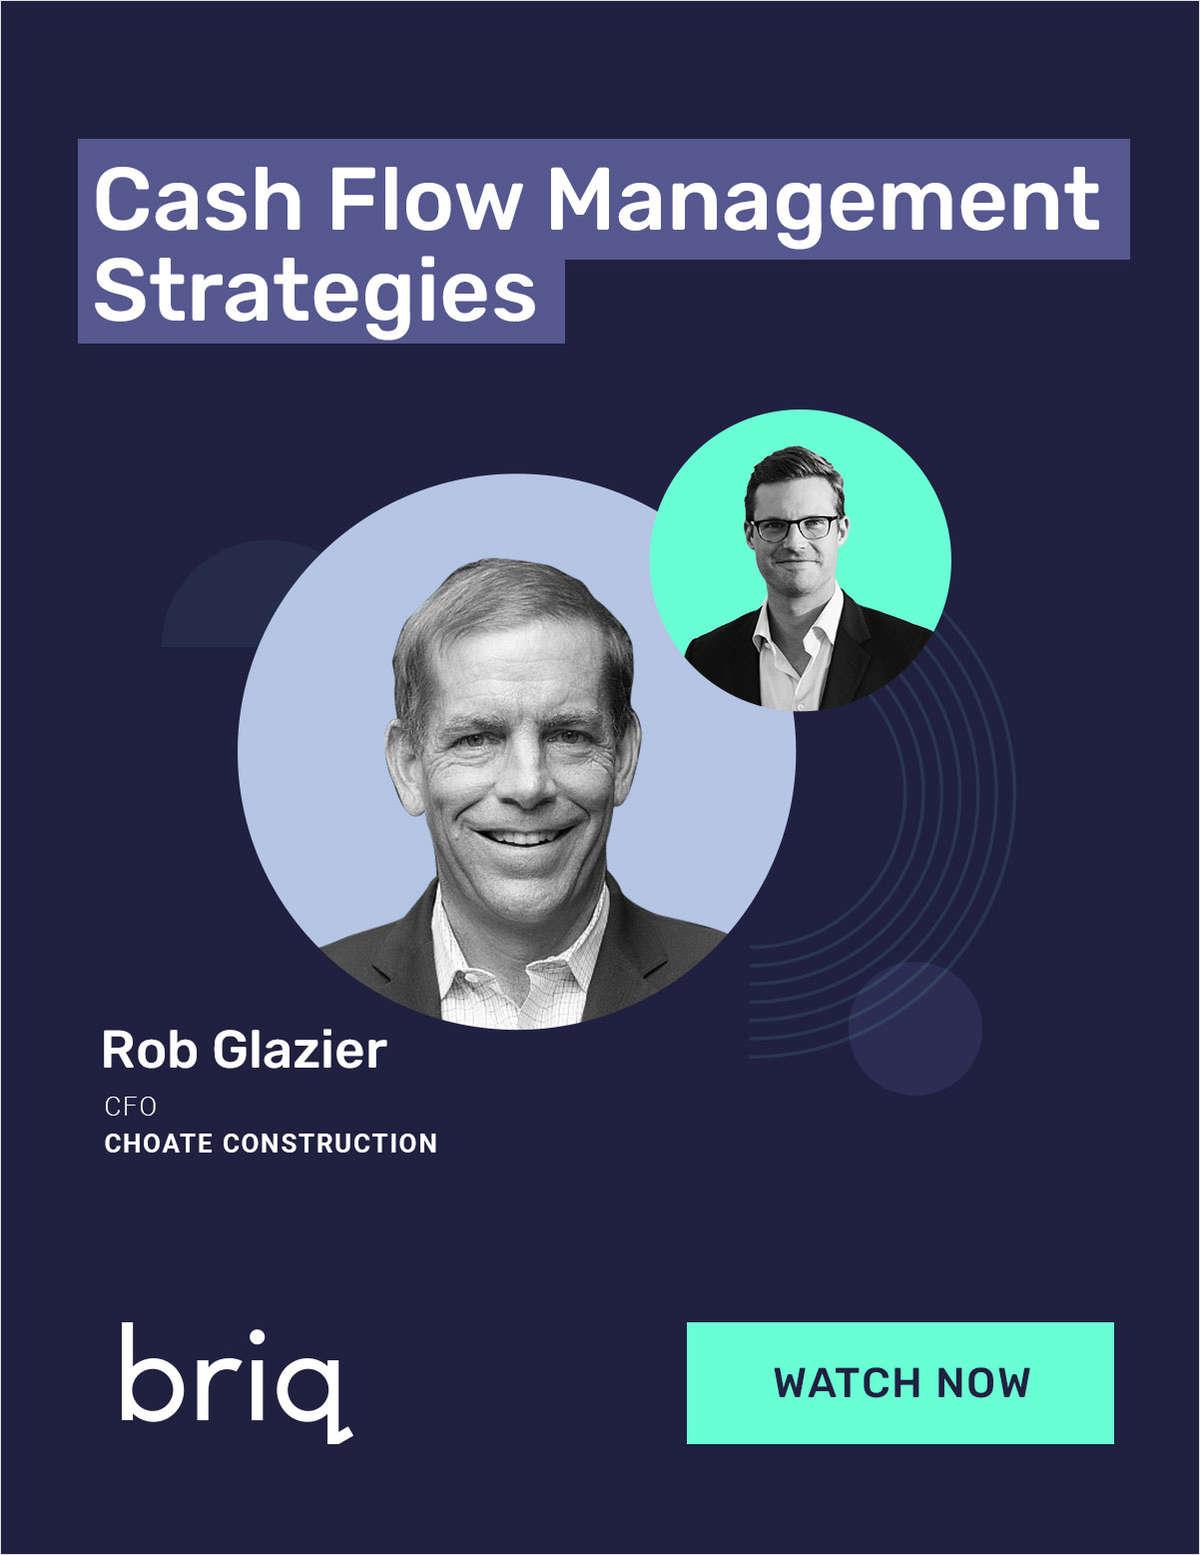 [Video] Cash Flow Management Best Strategies